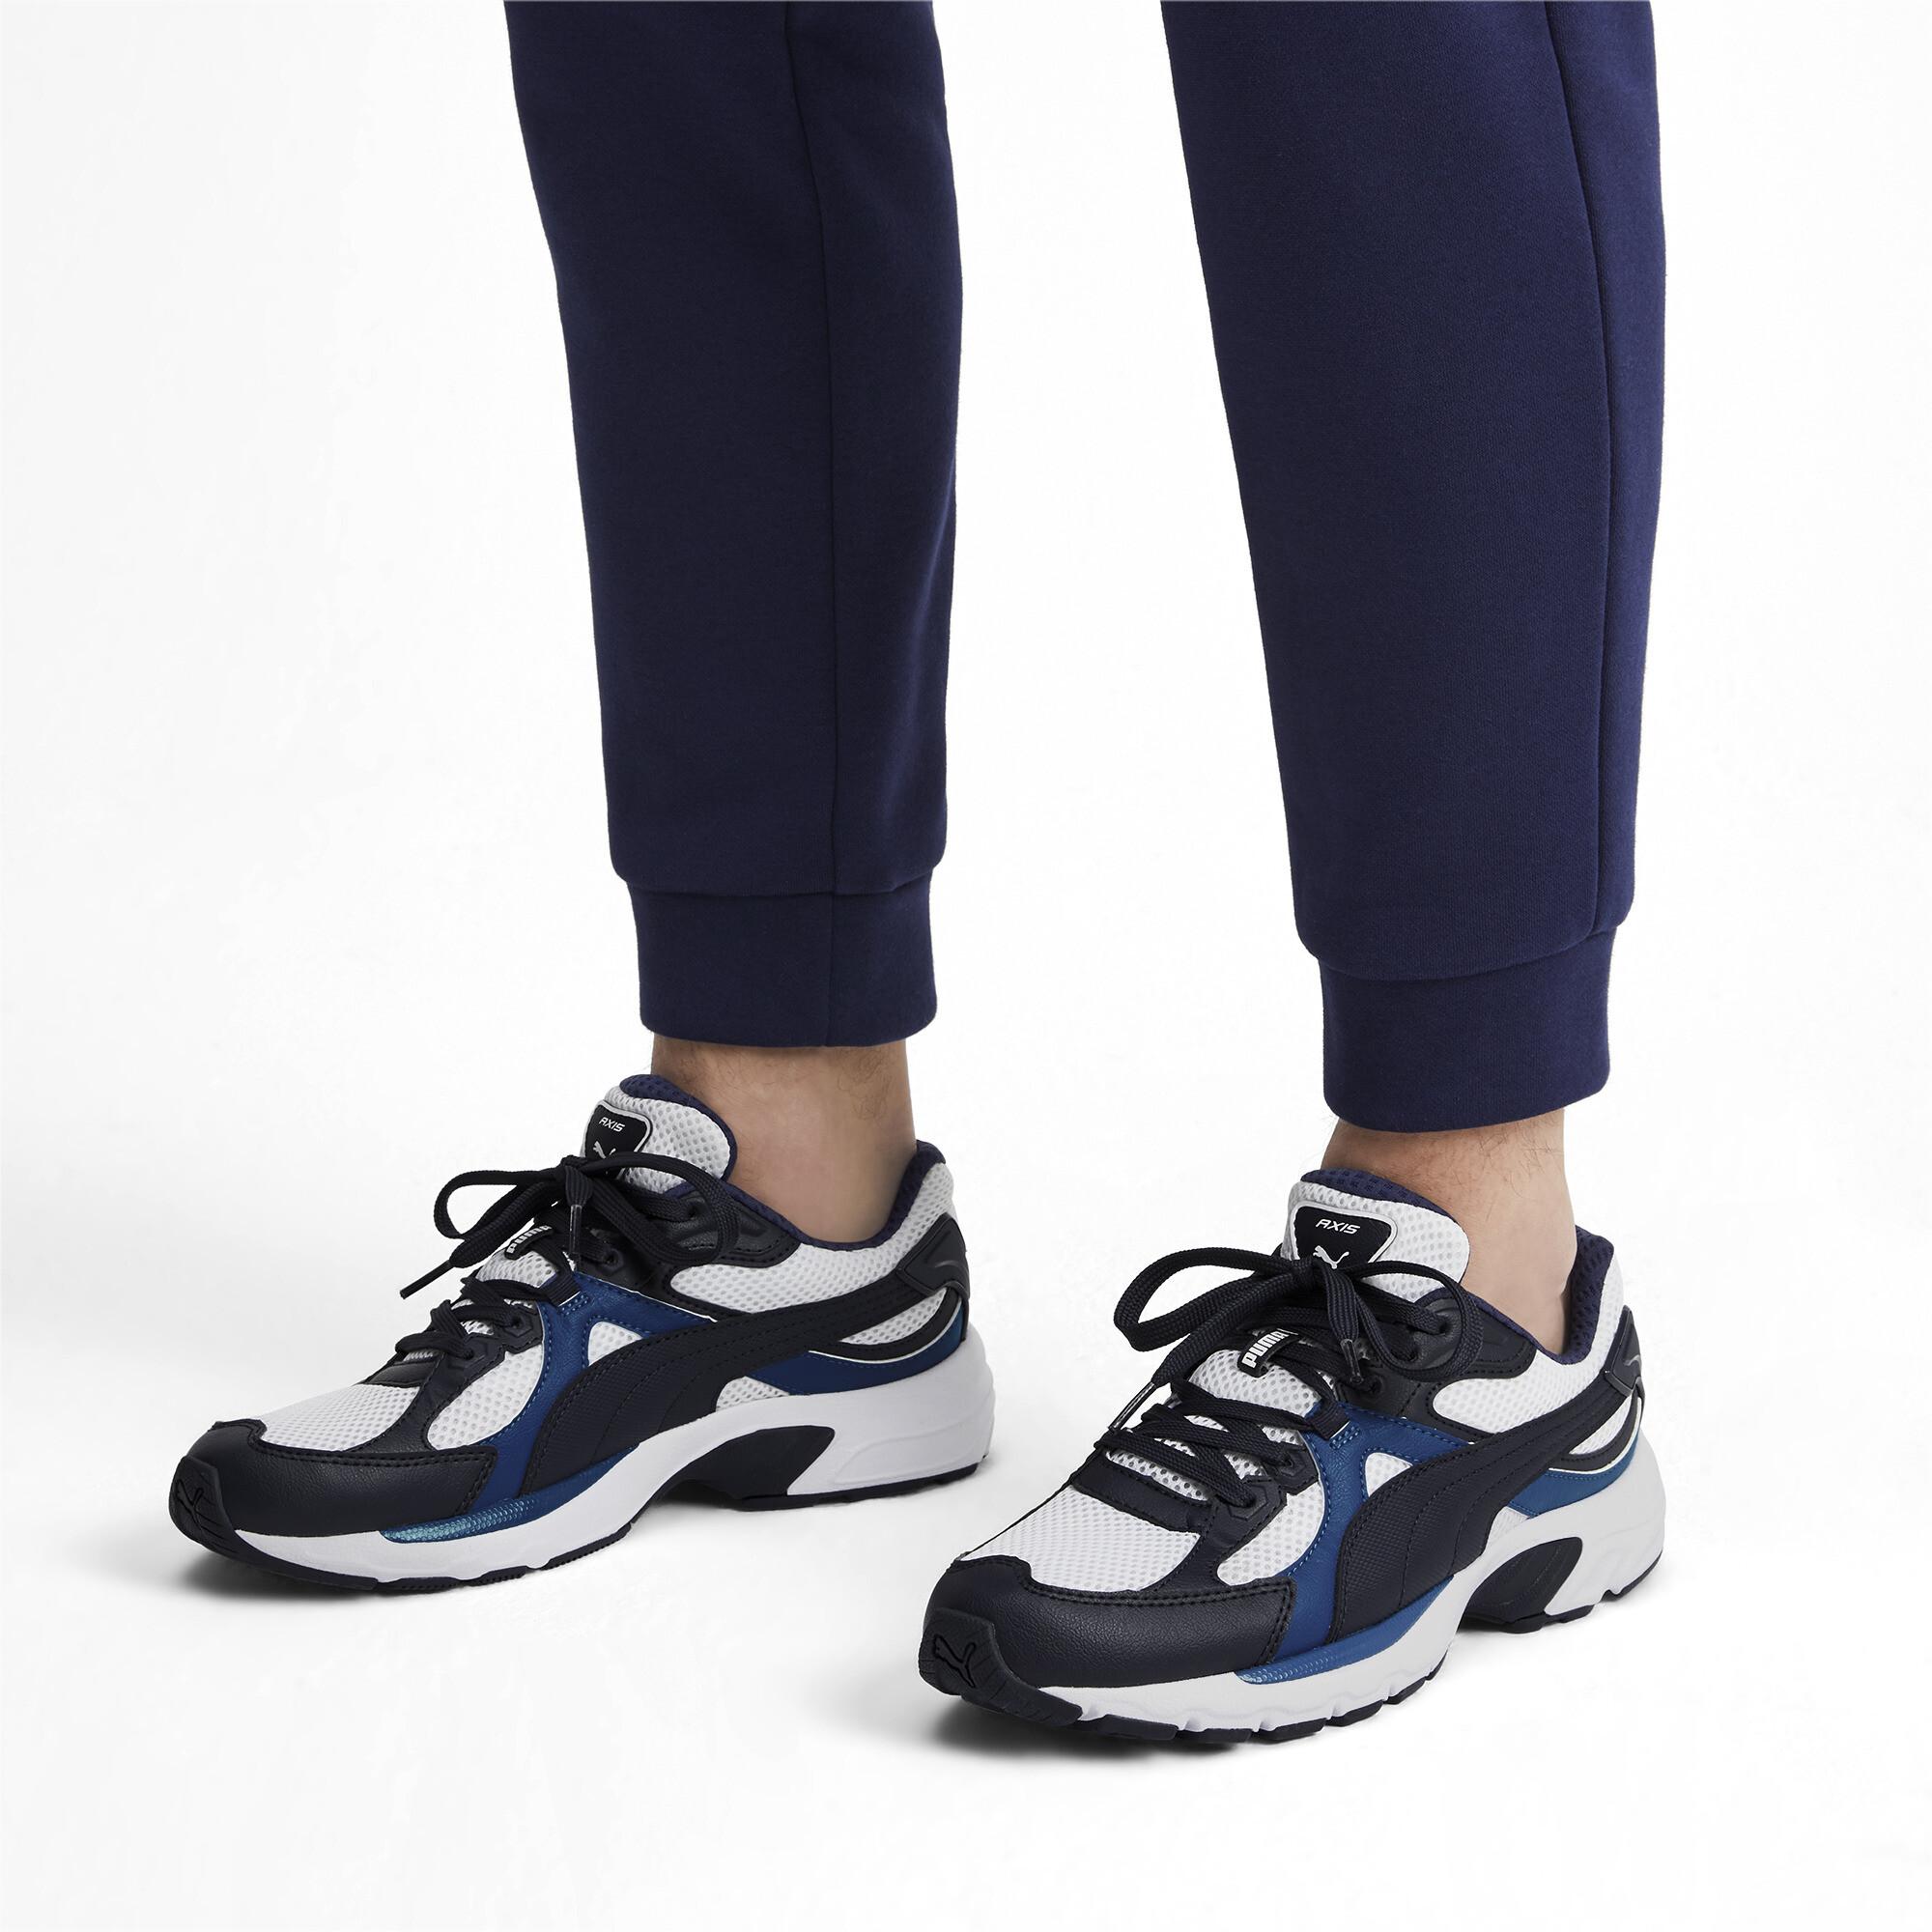 PUMA-Axis-Plus-90s-Sneakers-Men-Shoe-Basics thumbnail 25